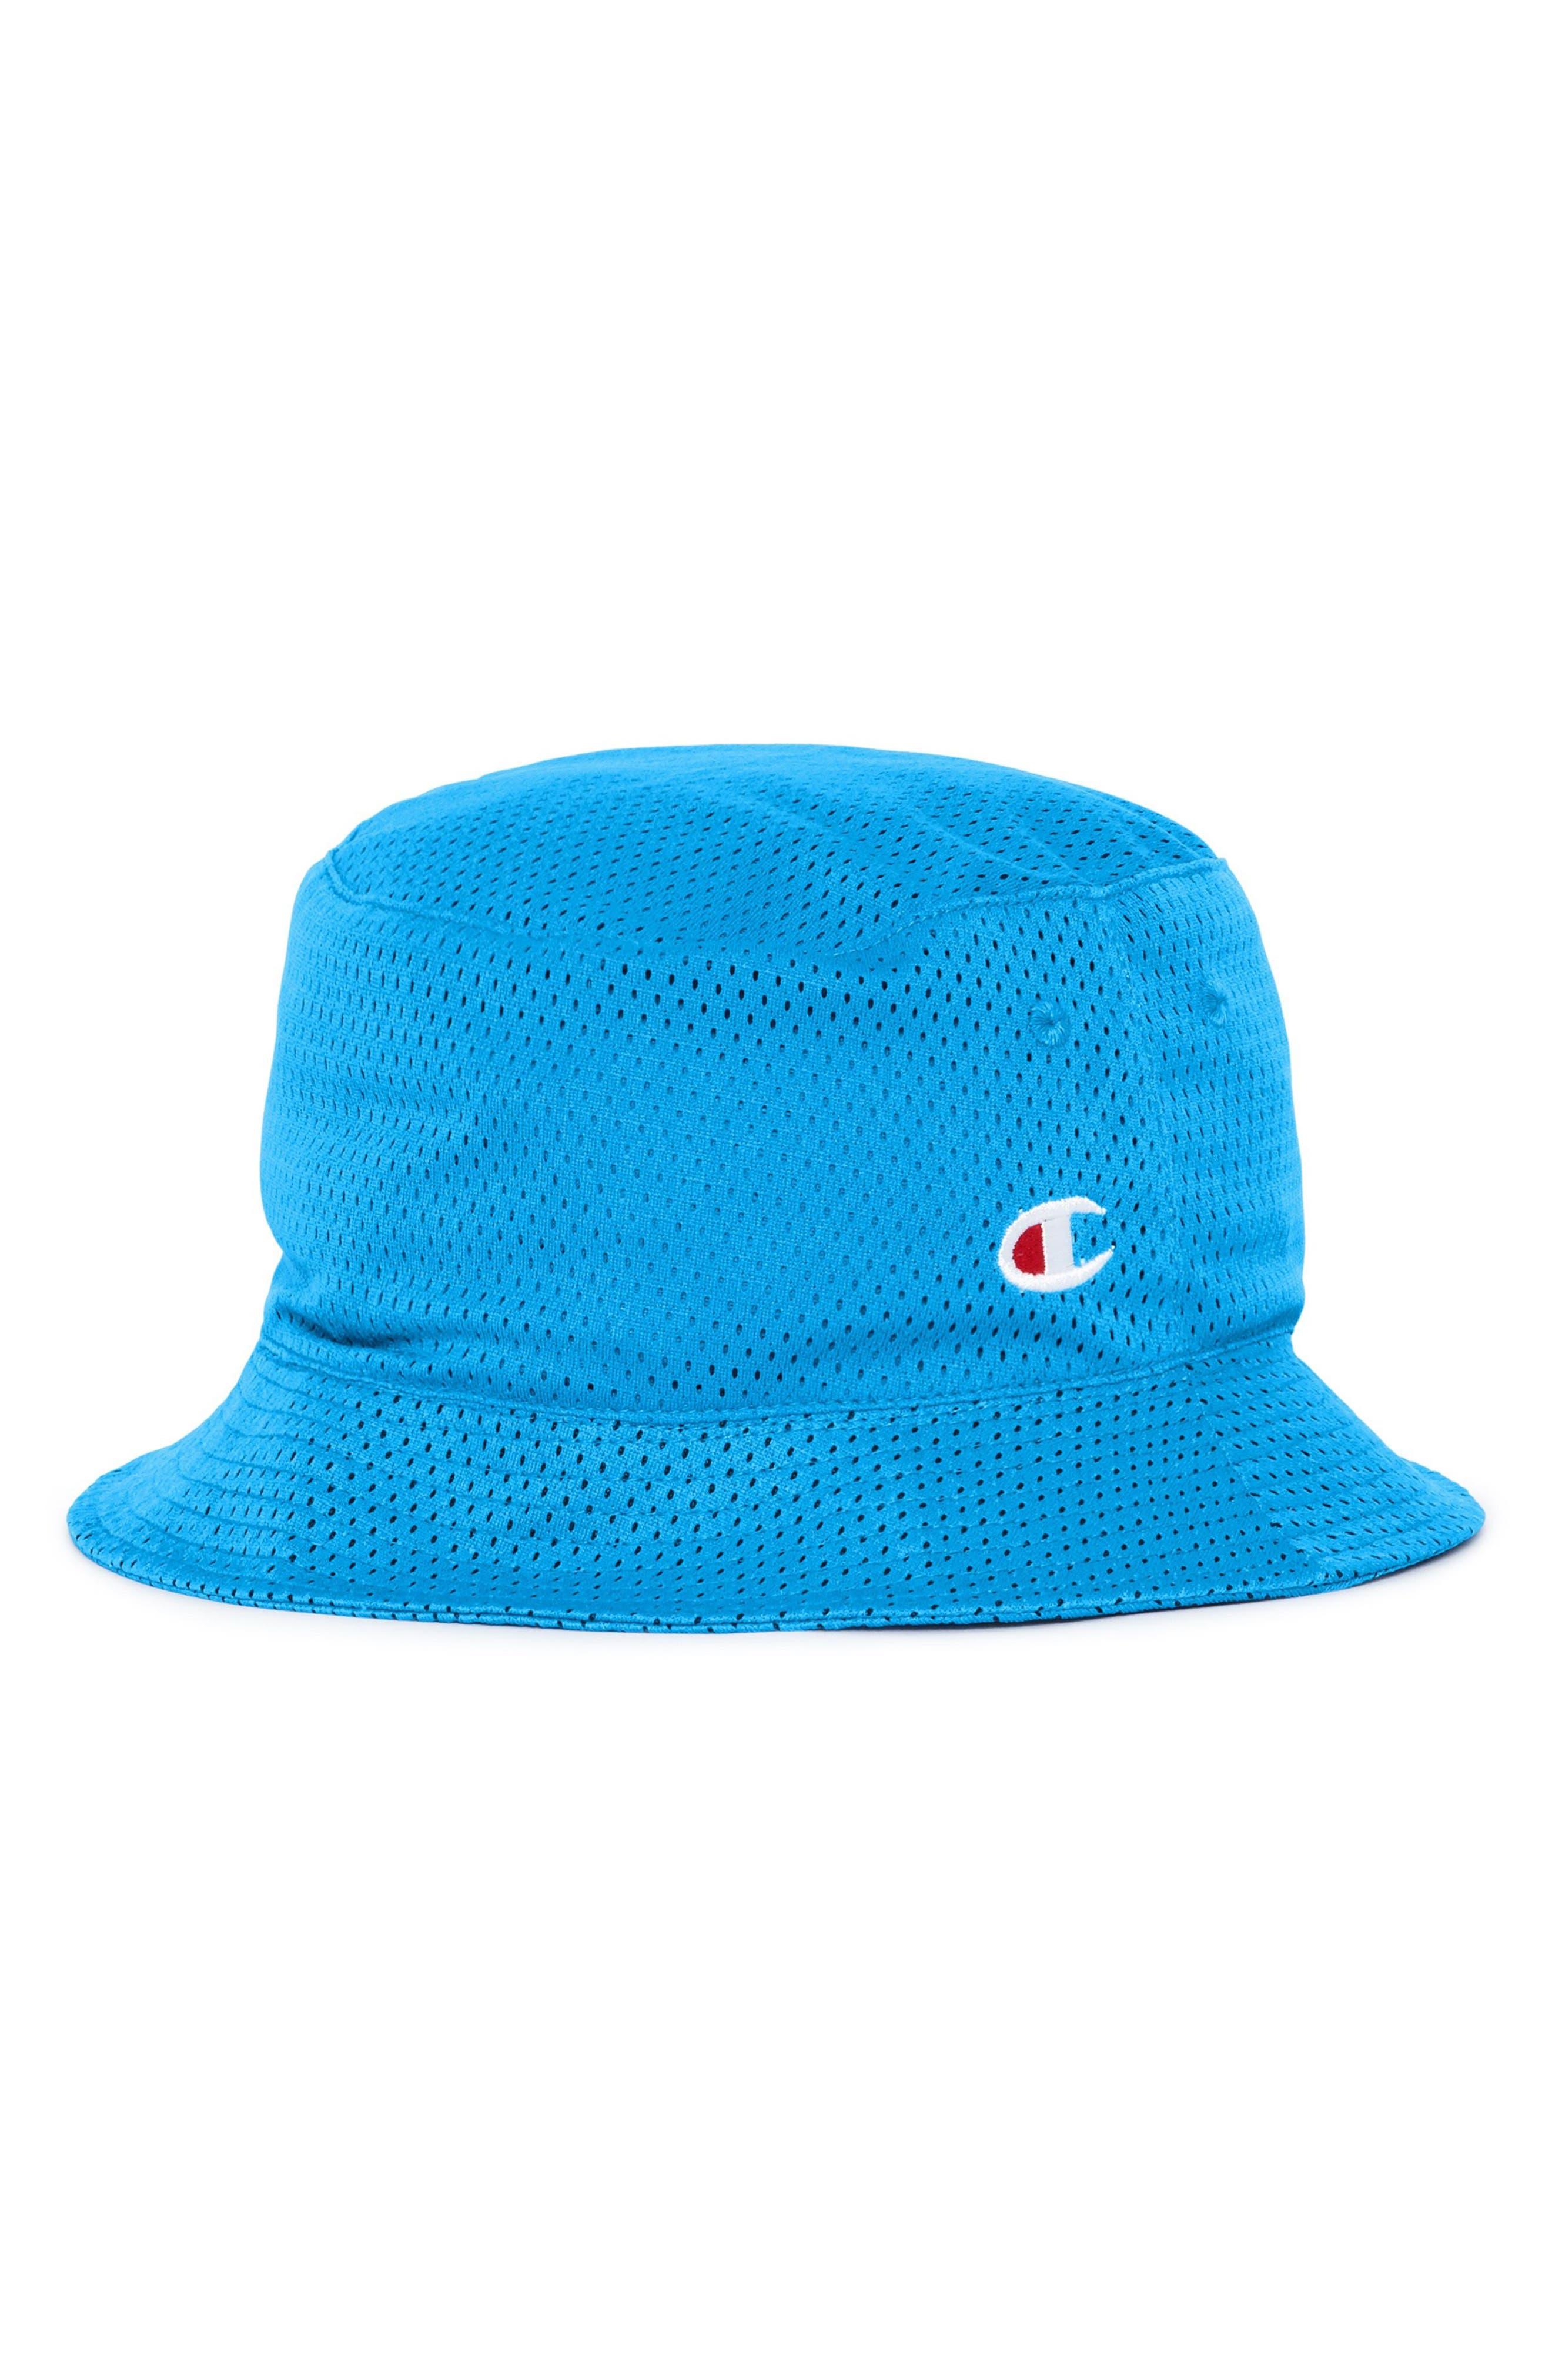 Reversible Mesh Bucket Hat,                         Main,                         color, Hotline Blue/ Black